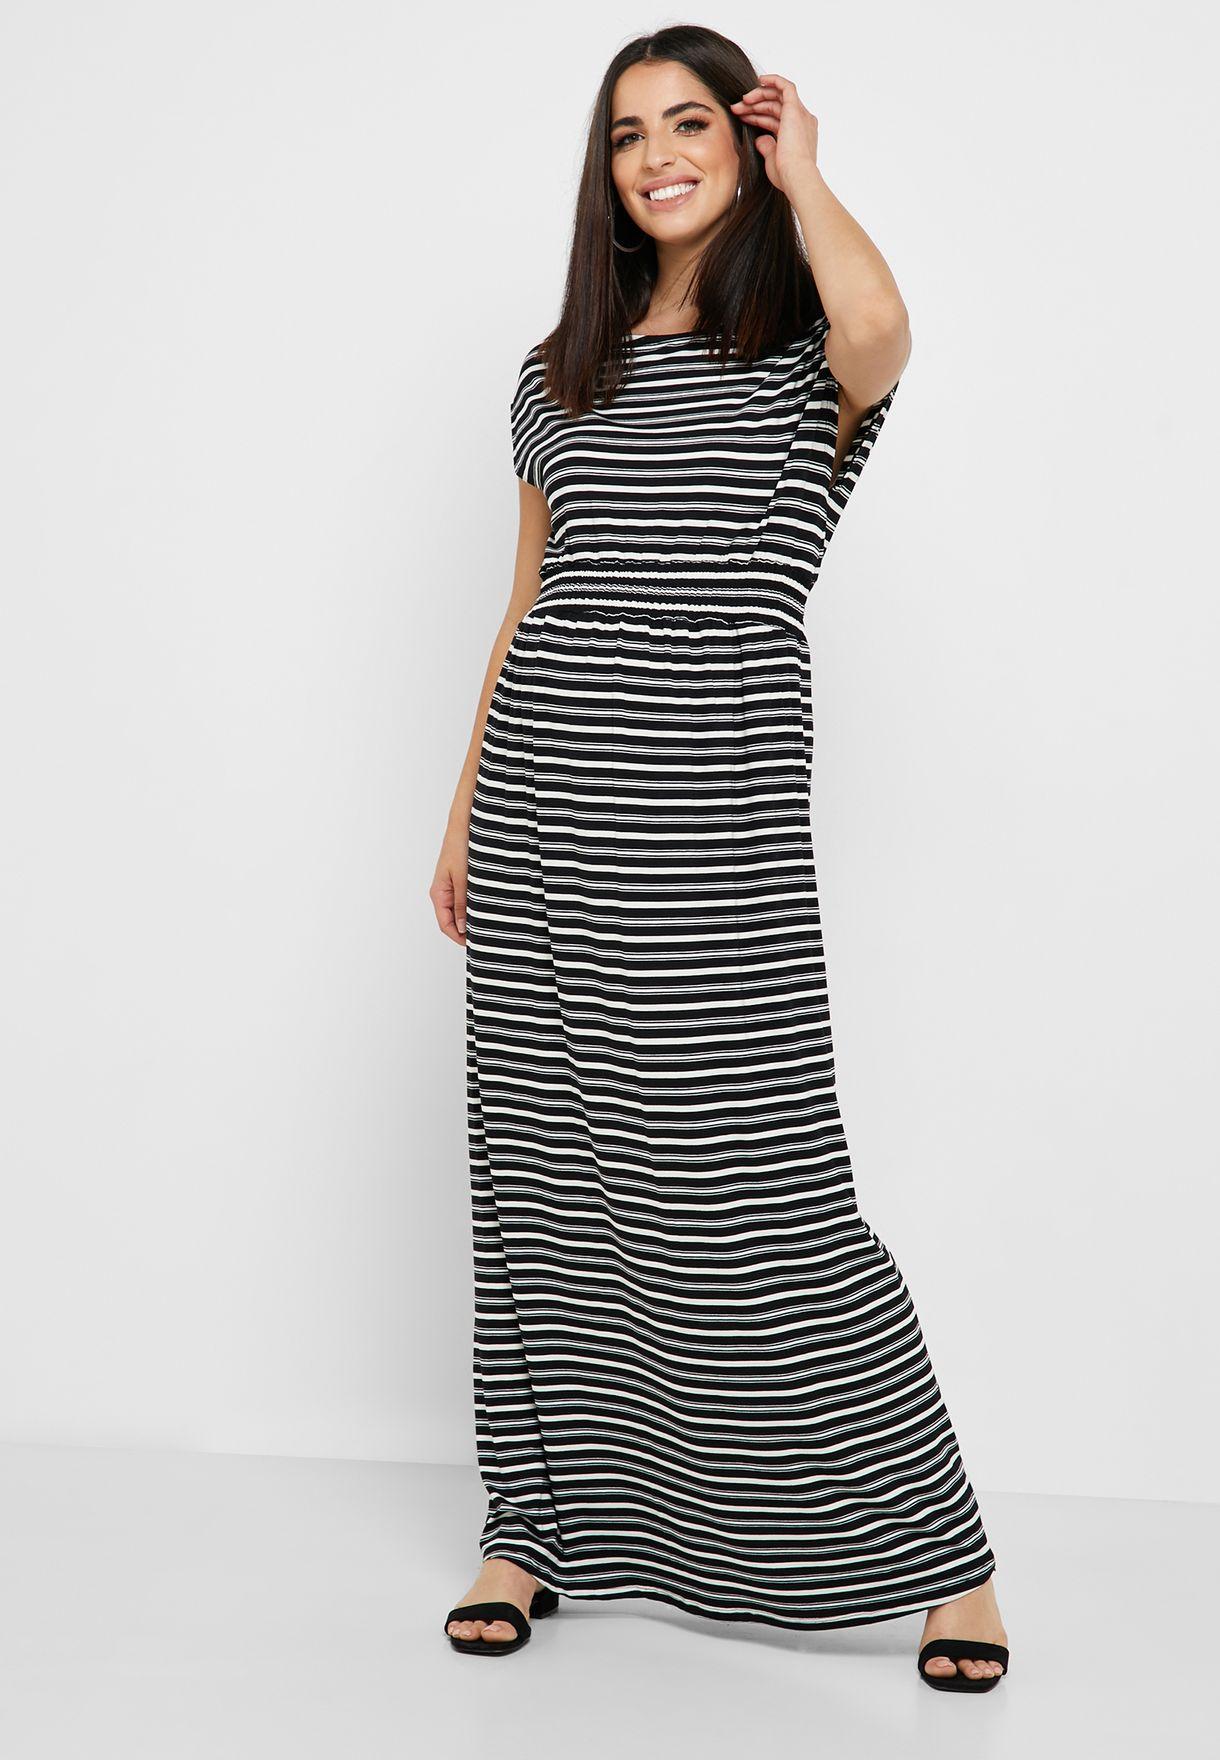 6bdf3d995e2 Shop Dorothy Perkins Maternity stripes Striped Maxi Dress 17203813 ...